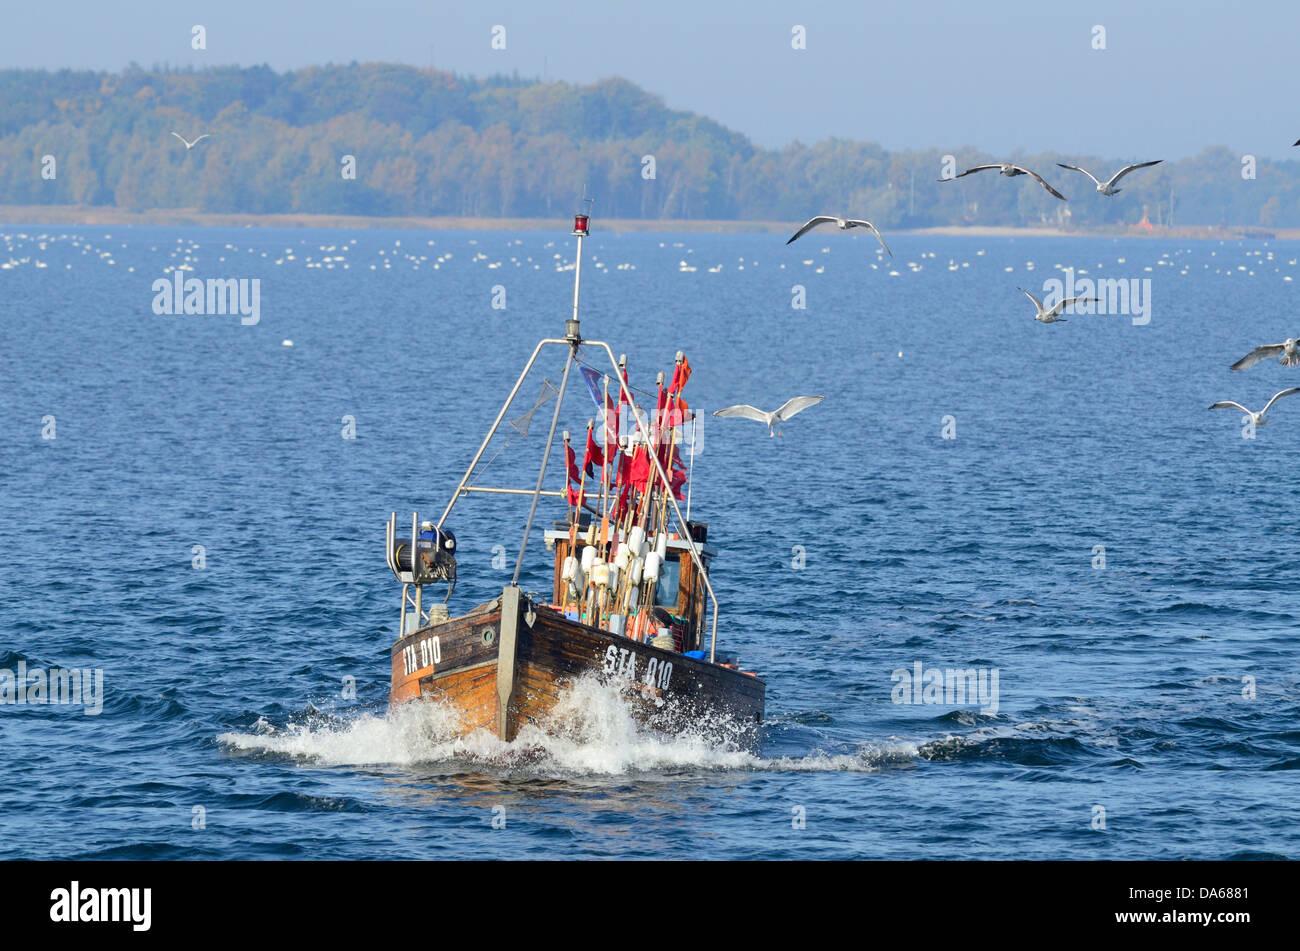 Fishing smack, fishery, gulls, Grabow, Zingst, Mecklenburg-Vorpommern, Germany - Stock Image